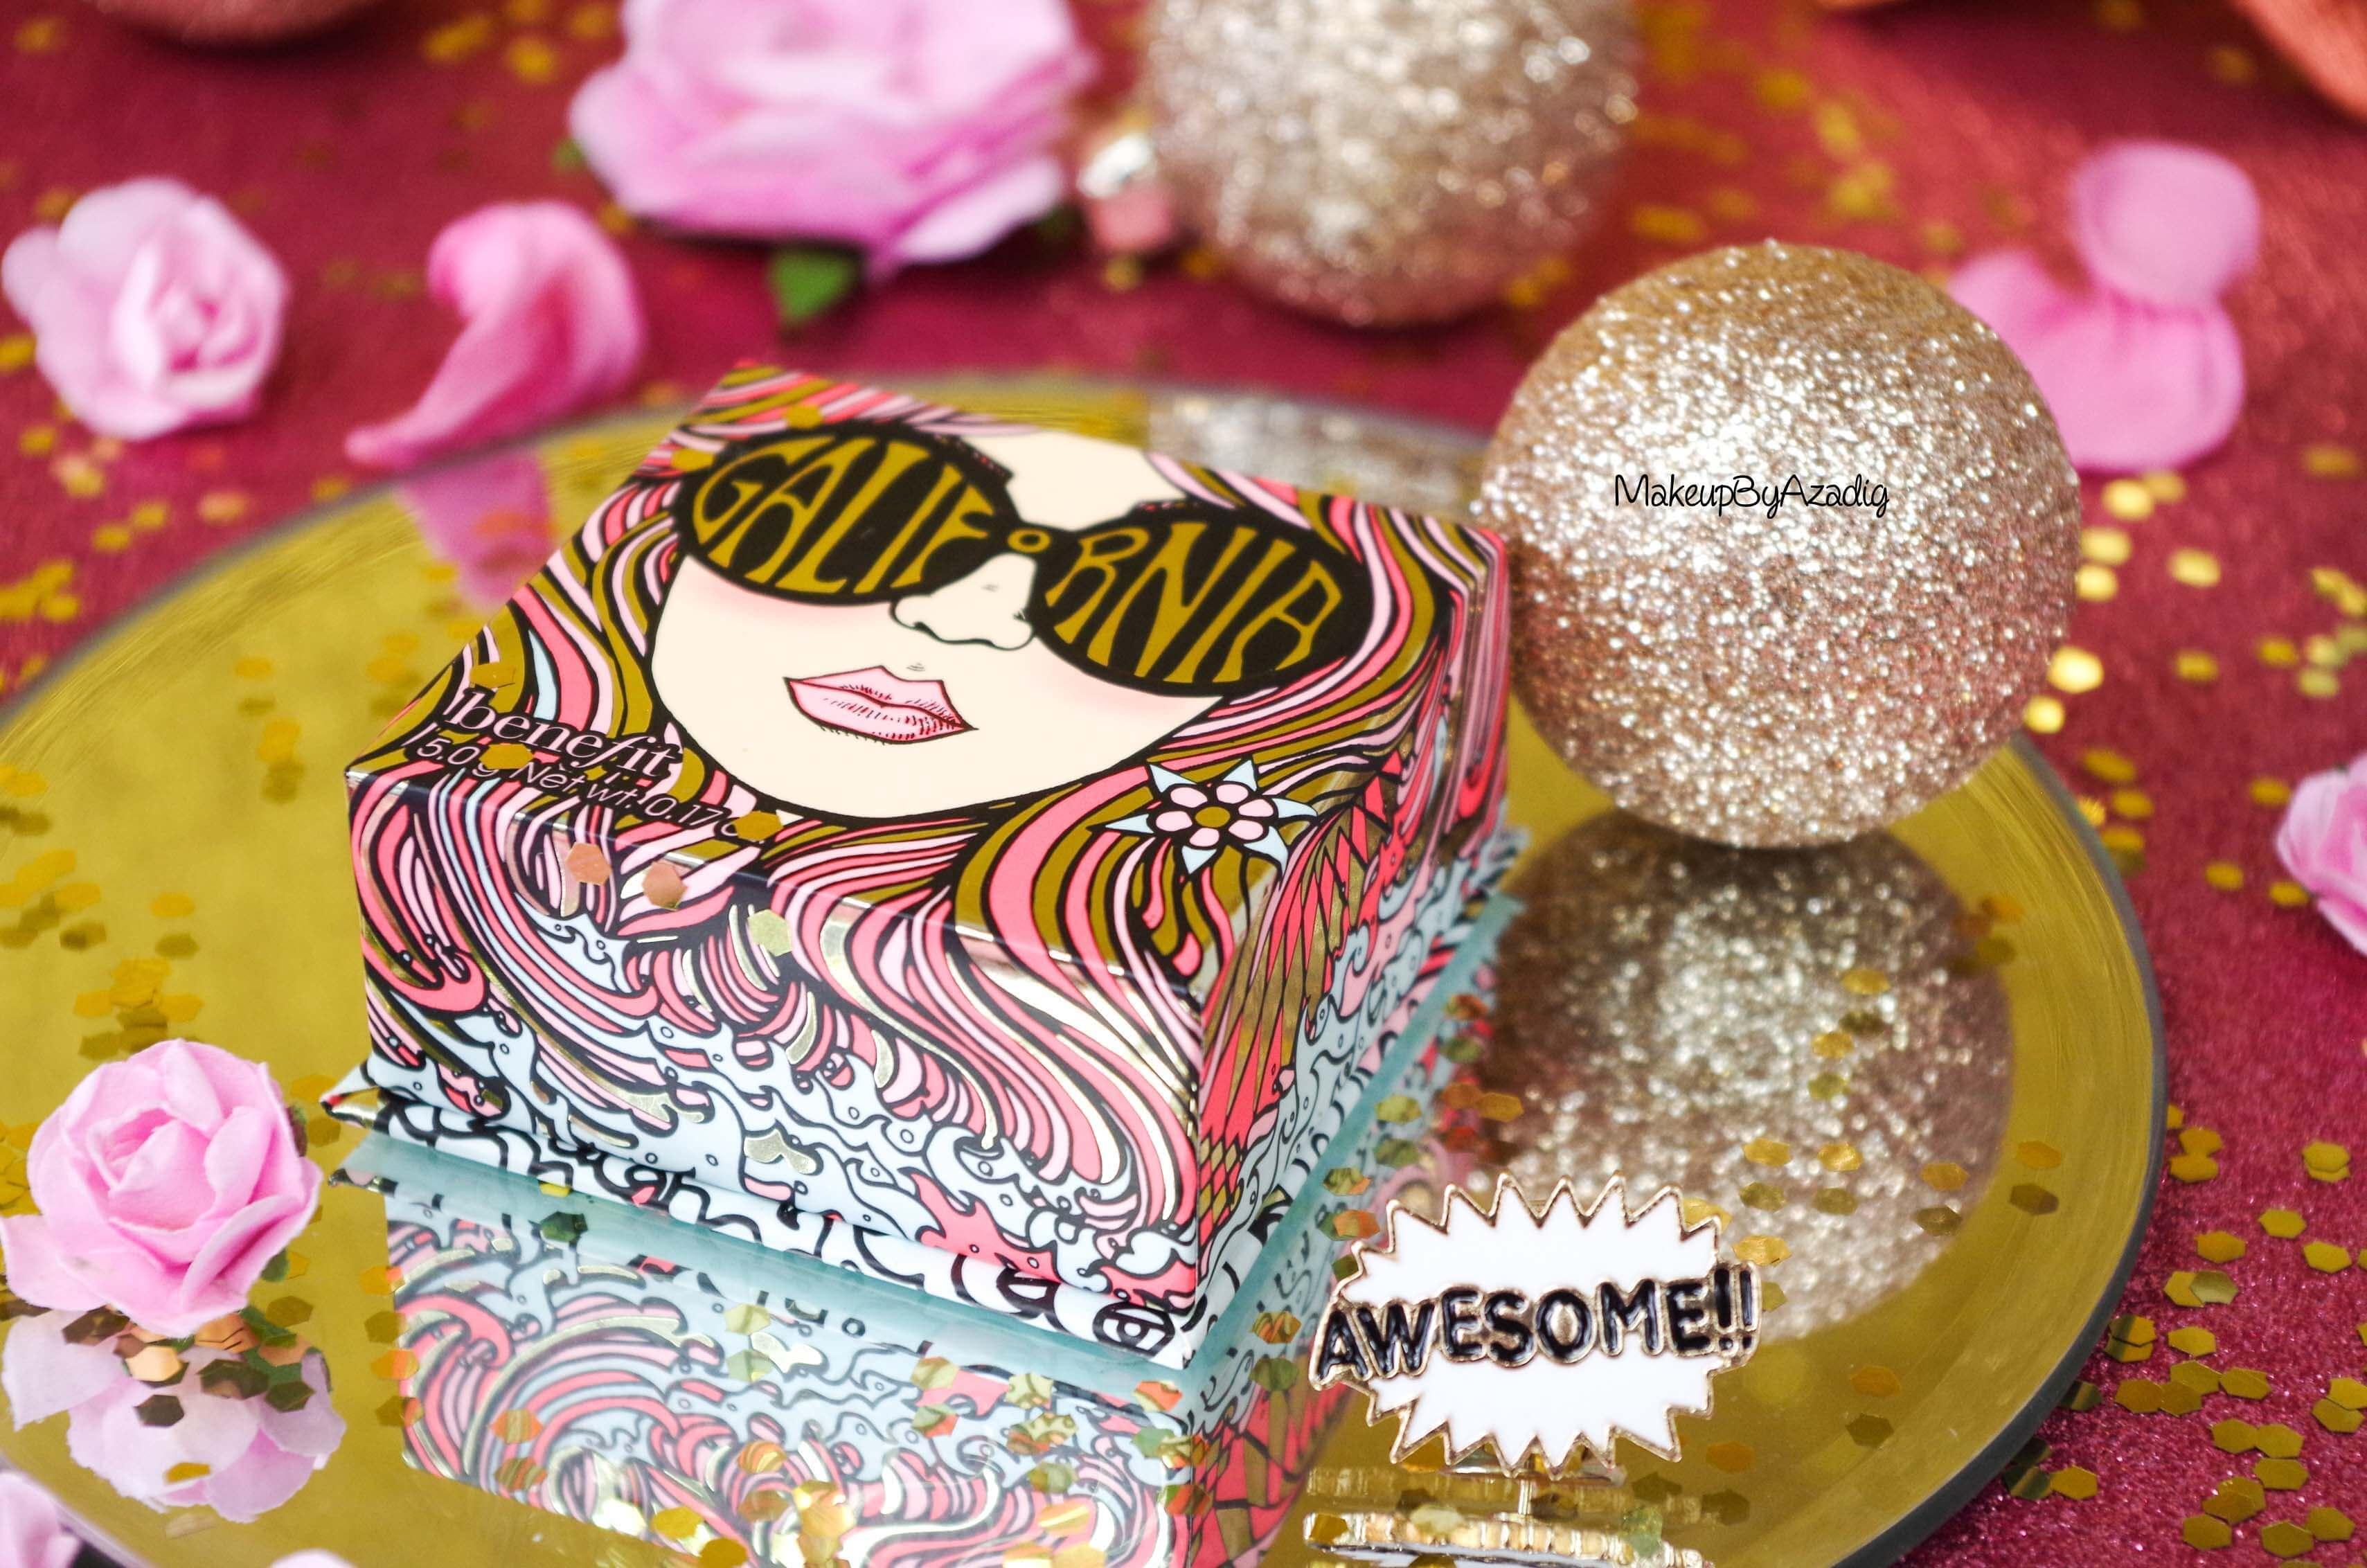 awesome-revue-review-blush-benefit-galifornia-san-francisco-sunny-golden-pink-blush-avis-prix-sephora-makeupbyazadig-coachella